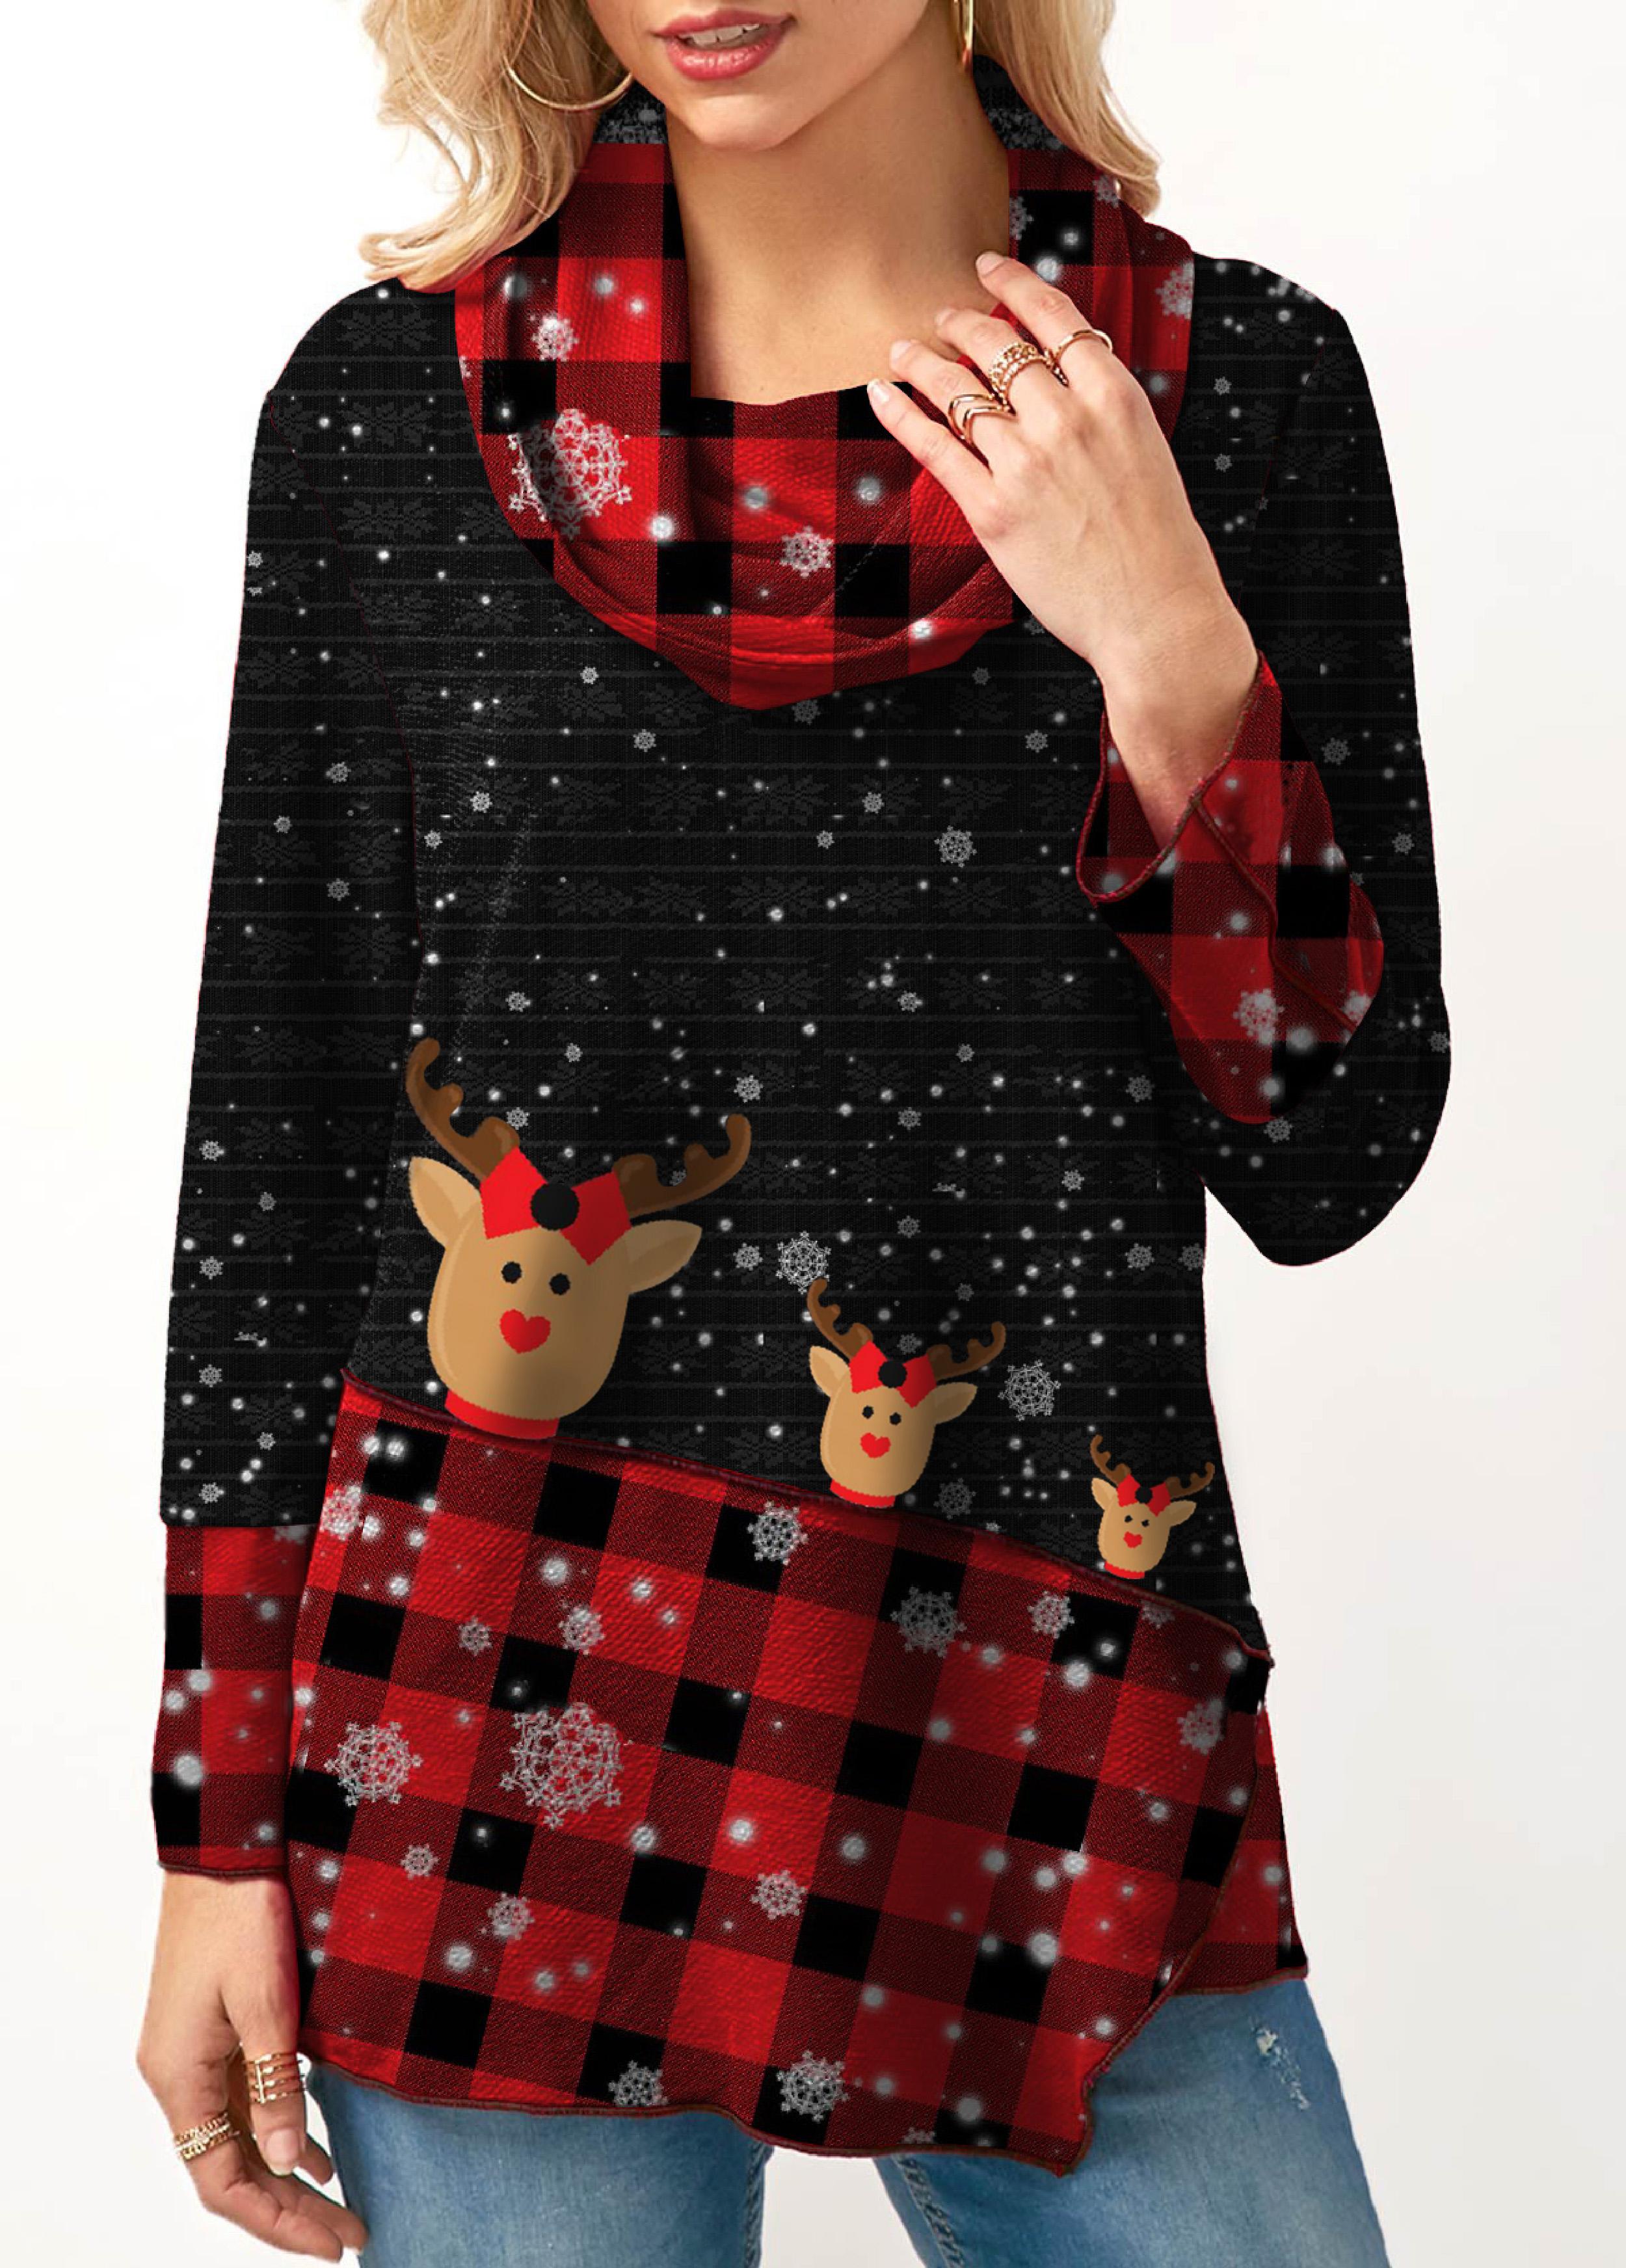 Plaid Print Cowl Neck Long Sleeve Christmas Sweatshirt